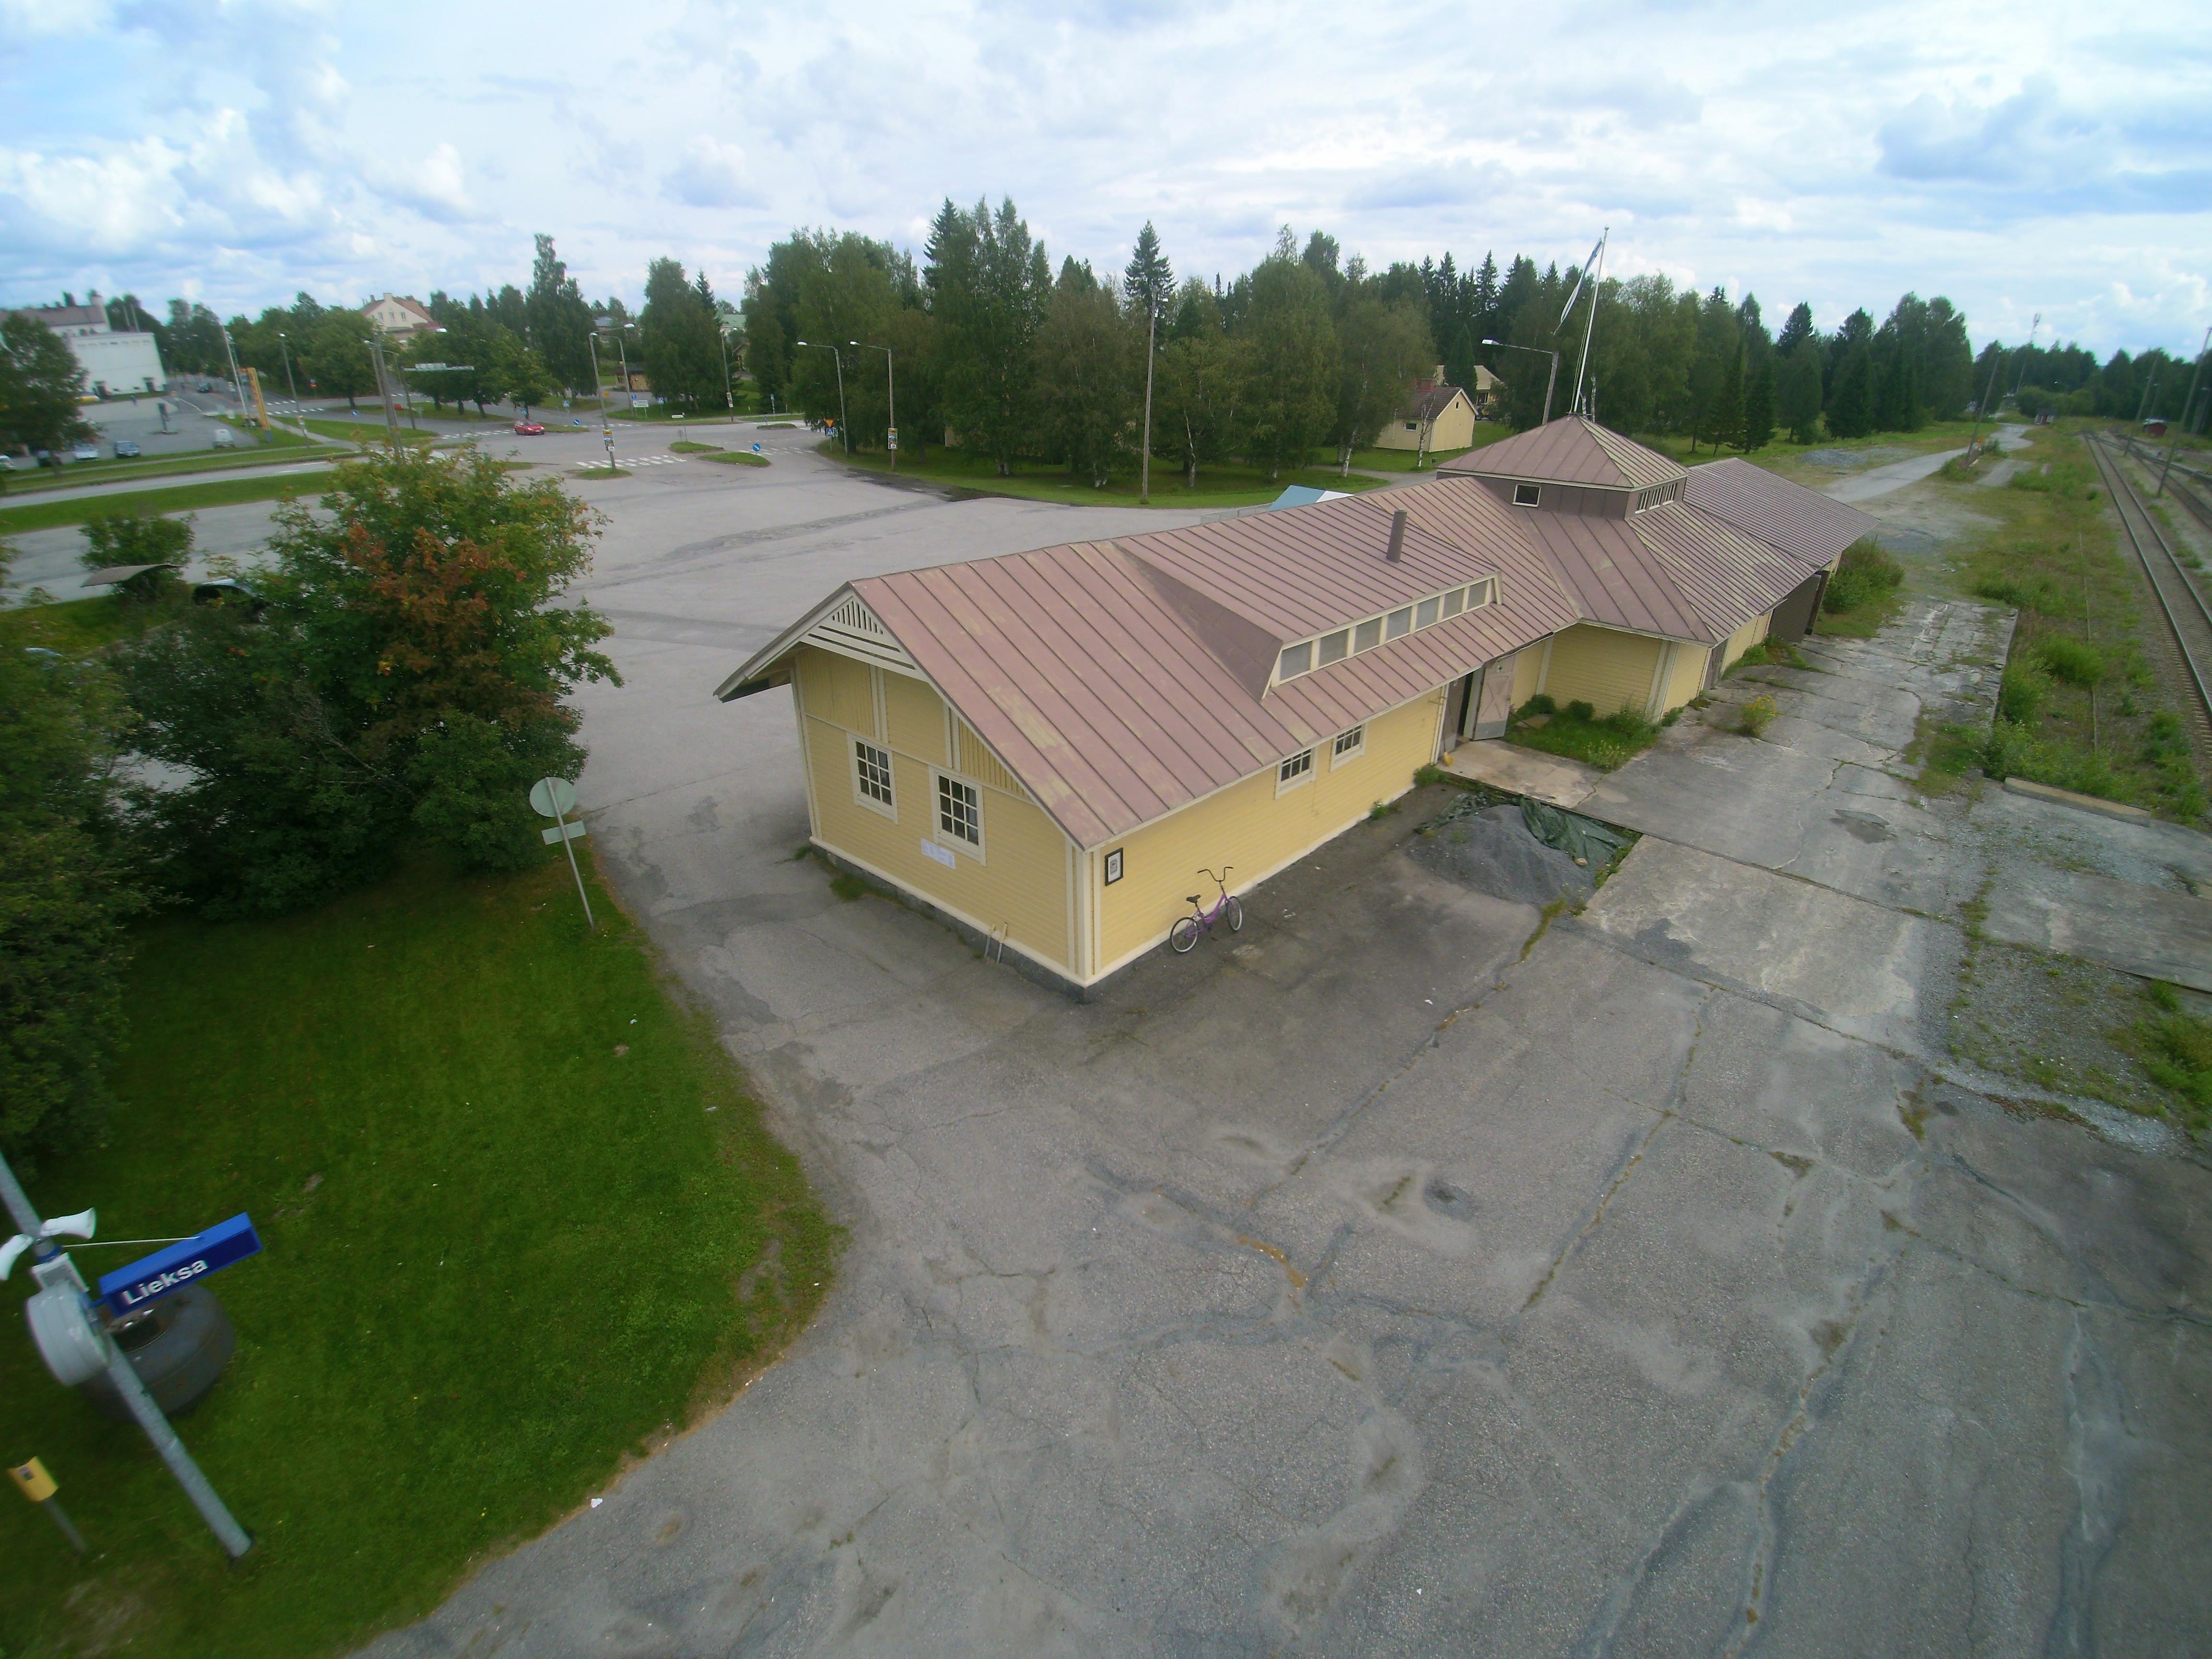 Rukajärvi-keskuksen pihapiiri